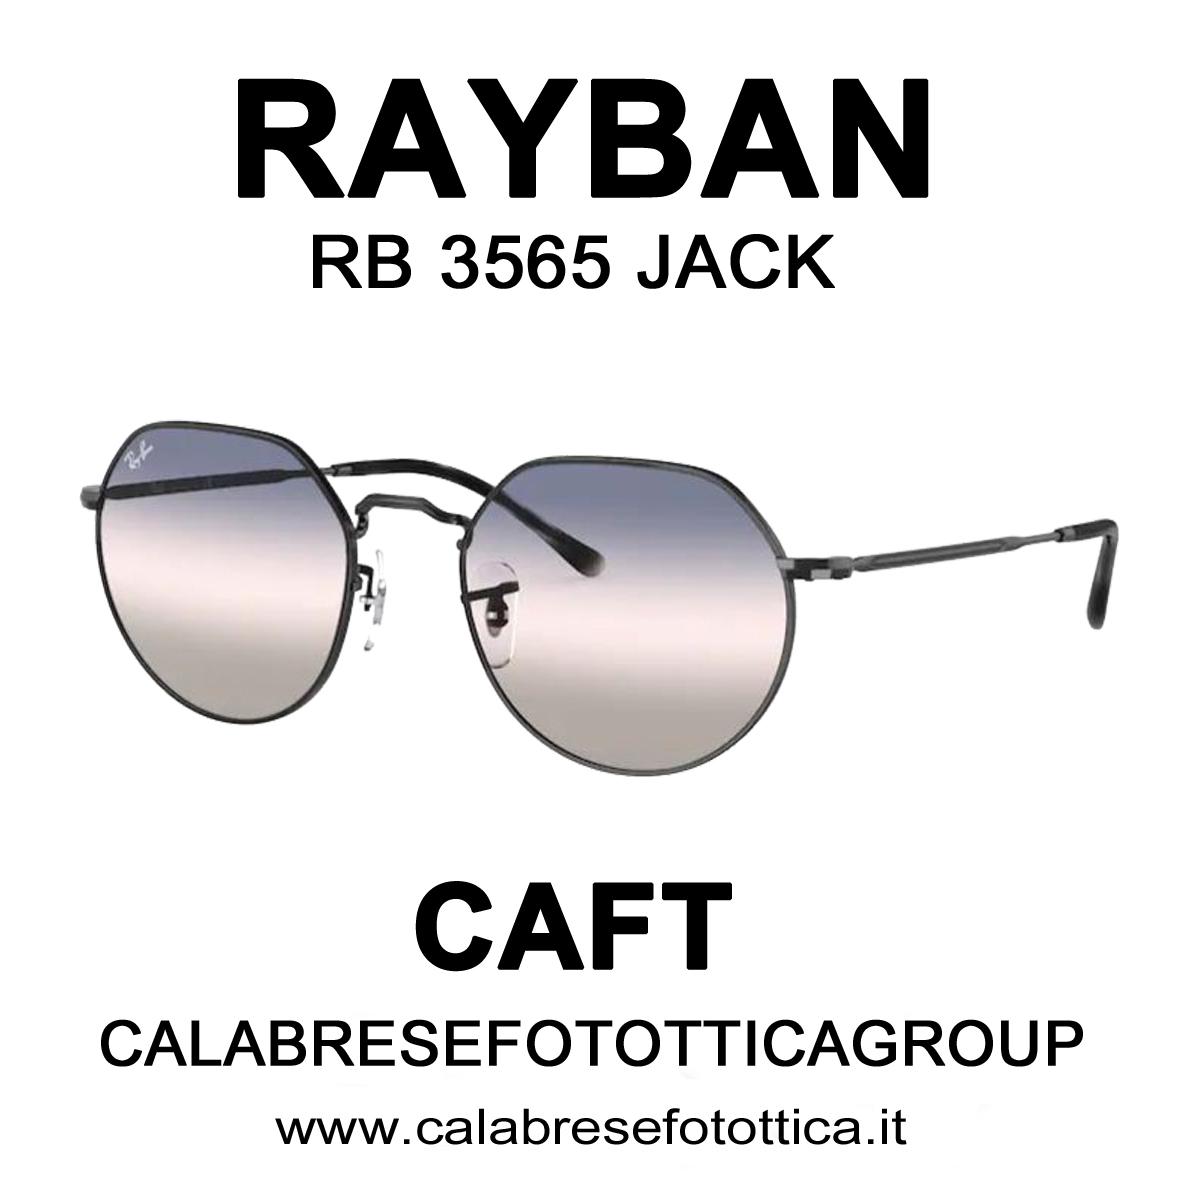 RAYBAN SOLE RB 3565 JACK DA CAFT CALABRESE FOTOTTICA GROUP VIA EMILIA 68/72 SAN LAZZARO DI SAVENA